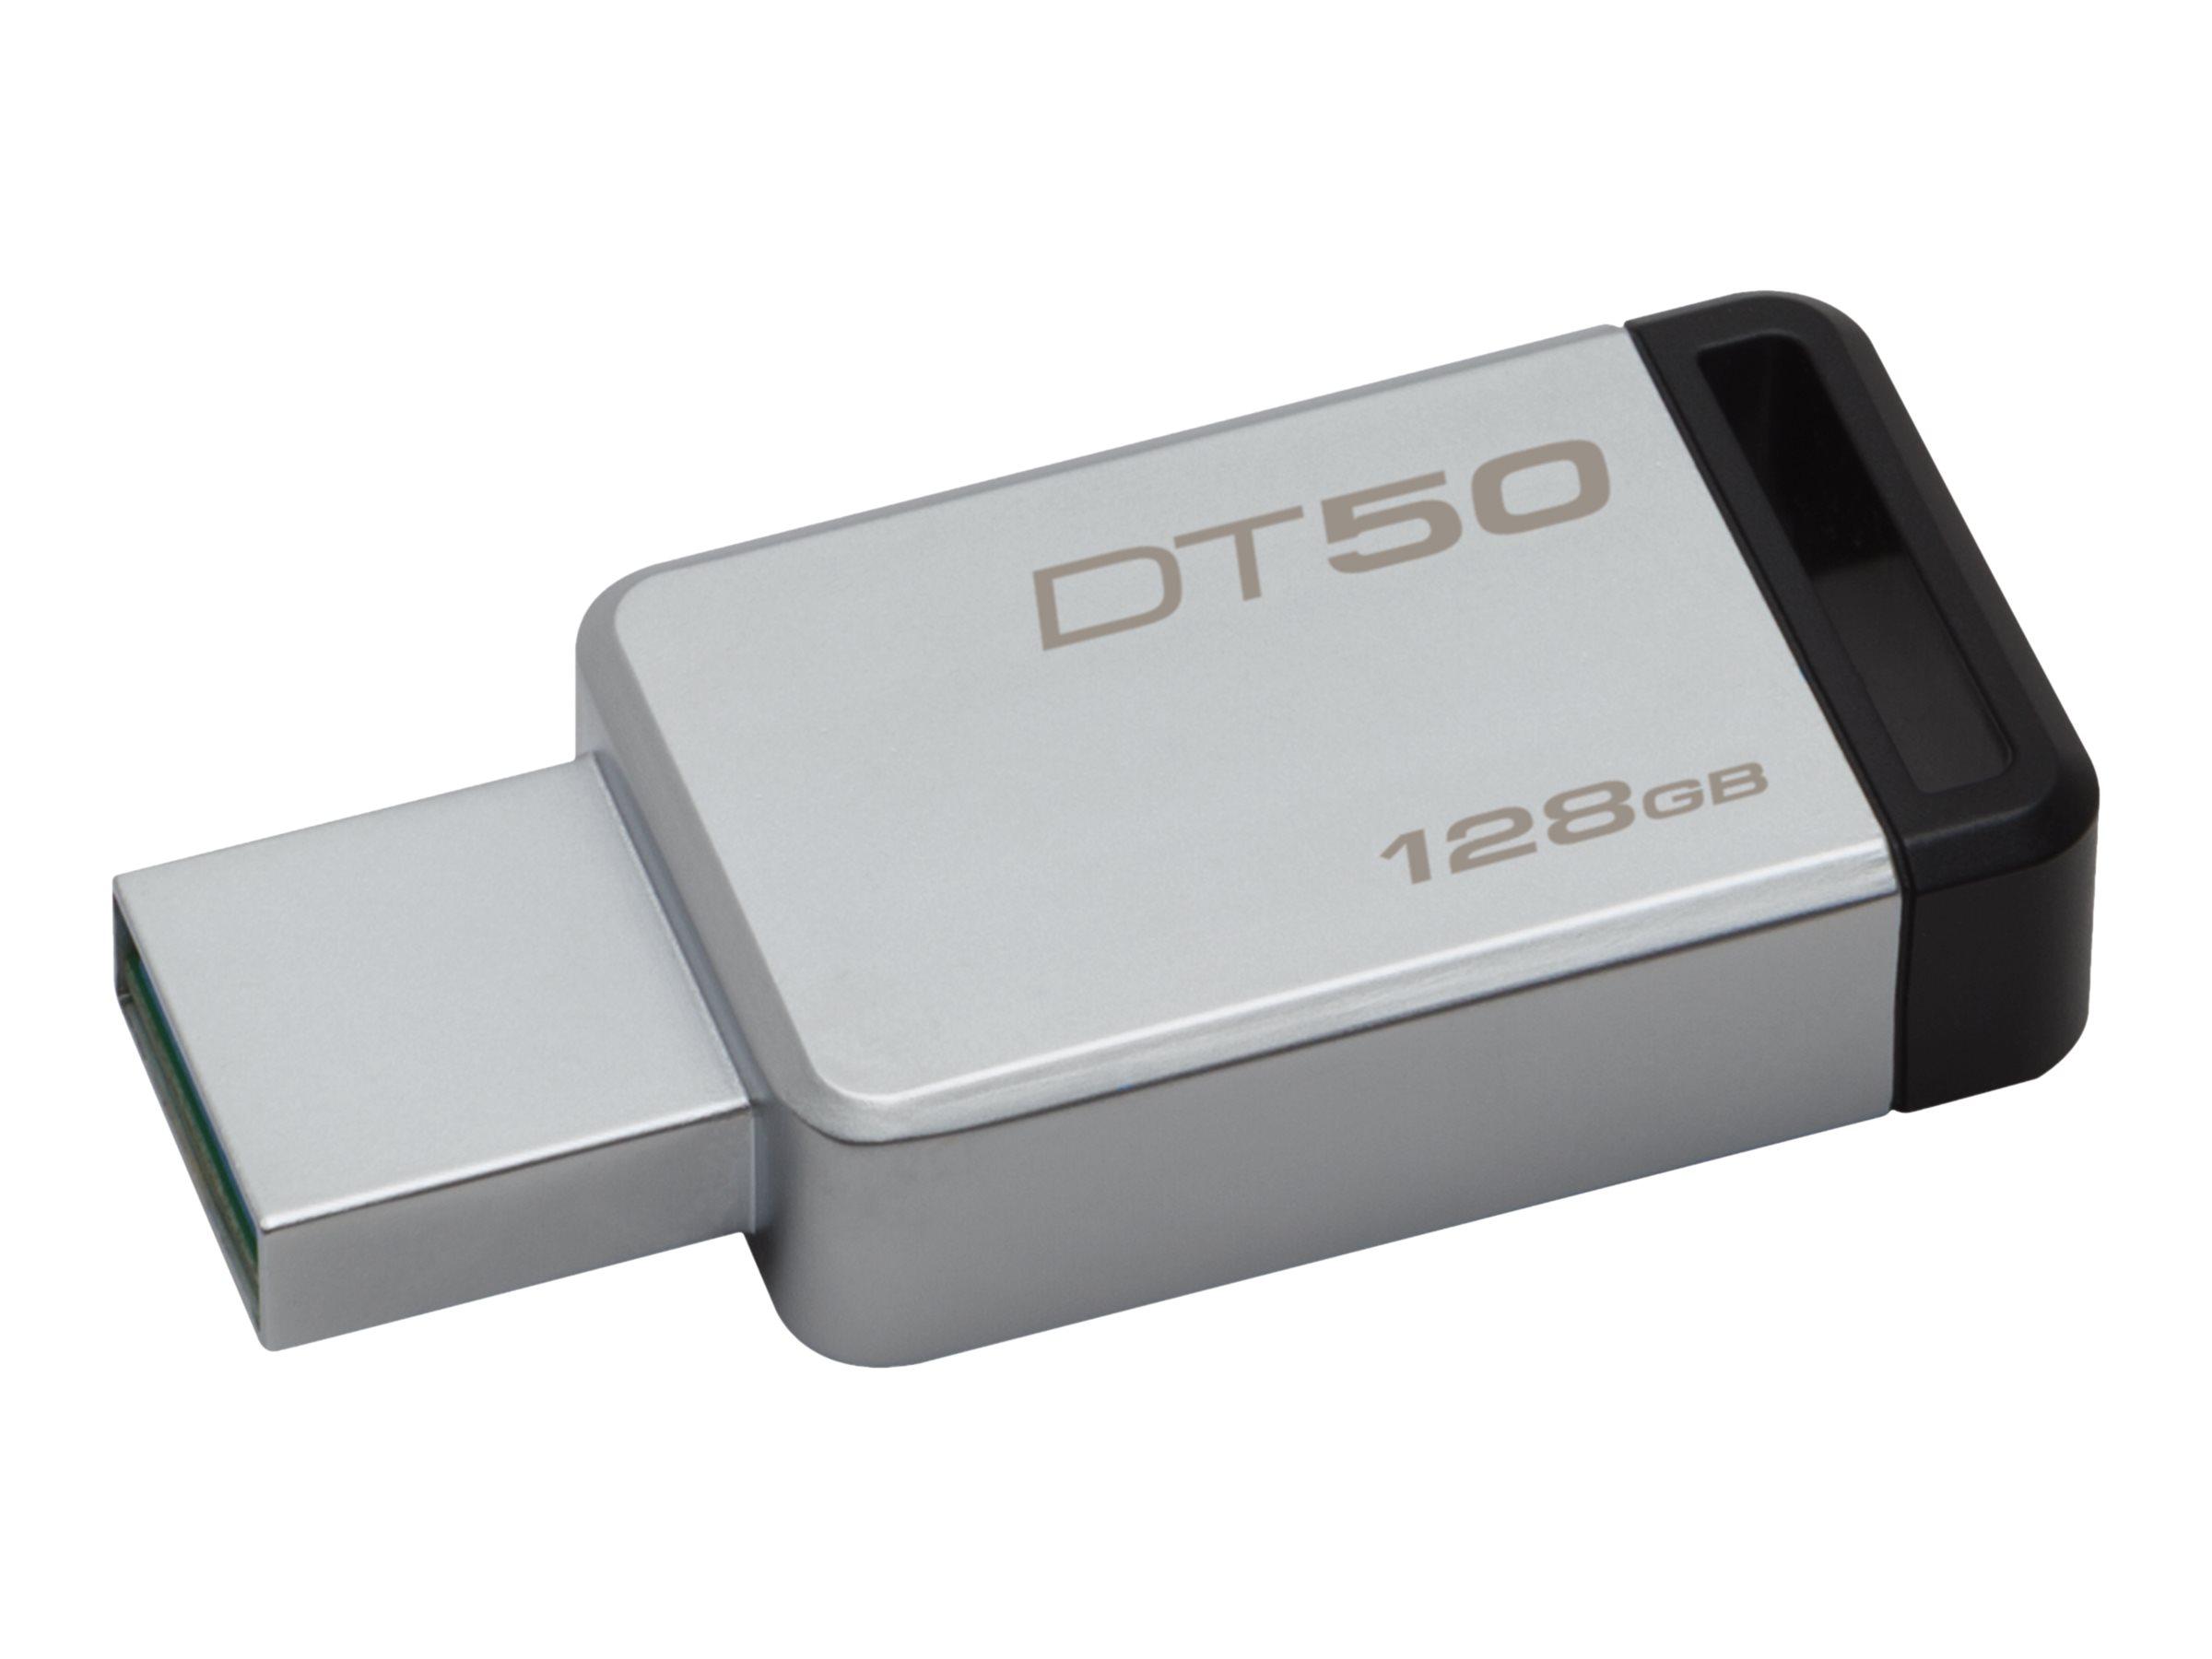 Kingston DataTraveler 50 - USB-Flash-Laufwerk - 128 GB - USB 3.1 - Schwarz